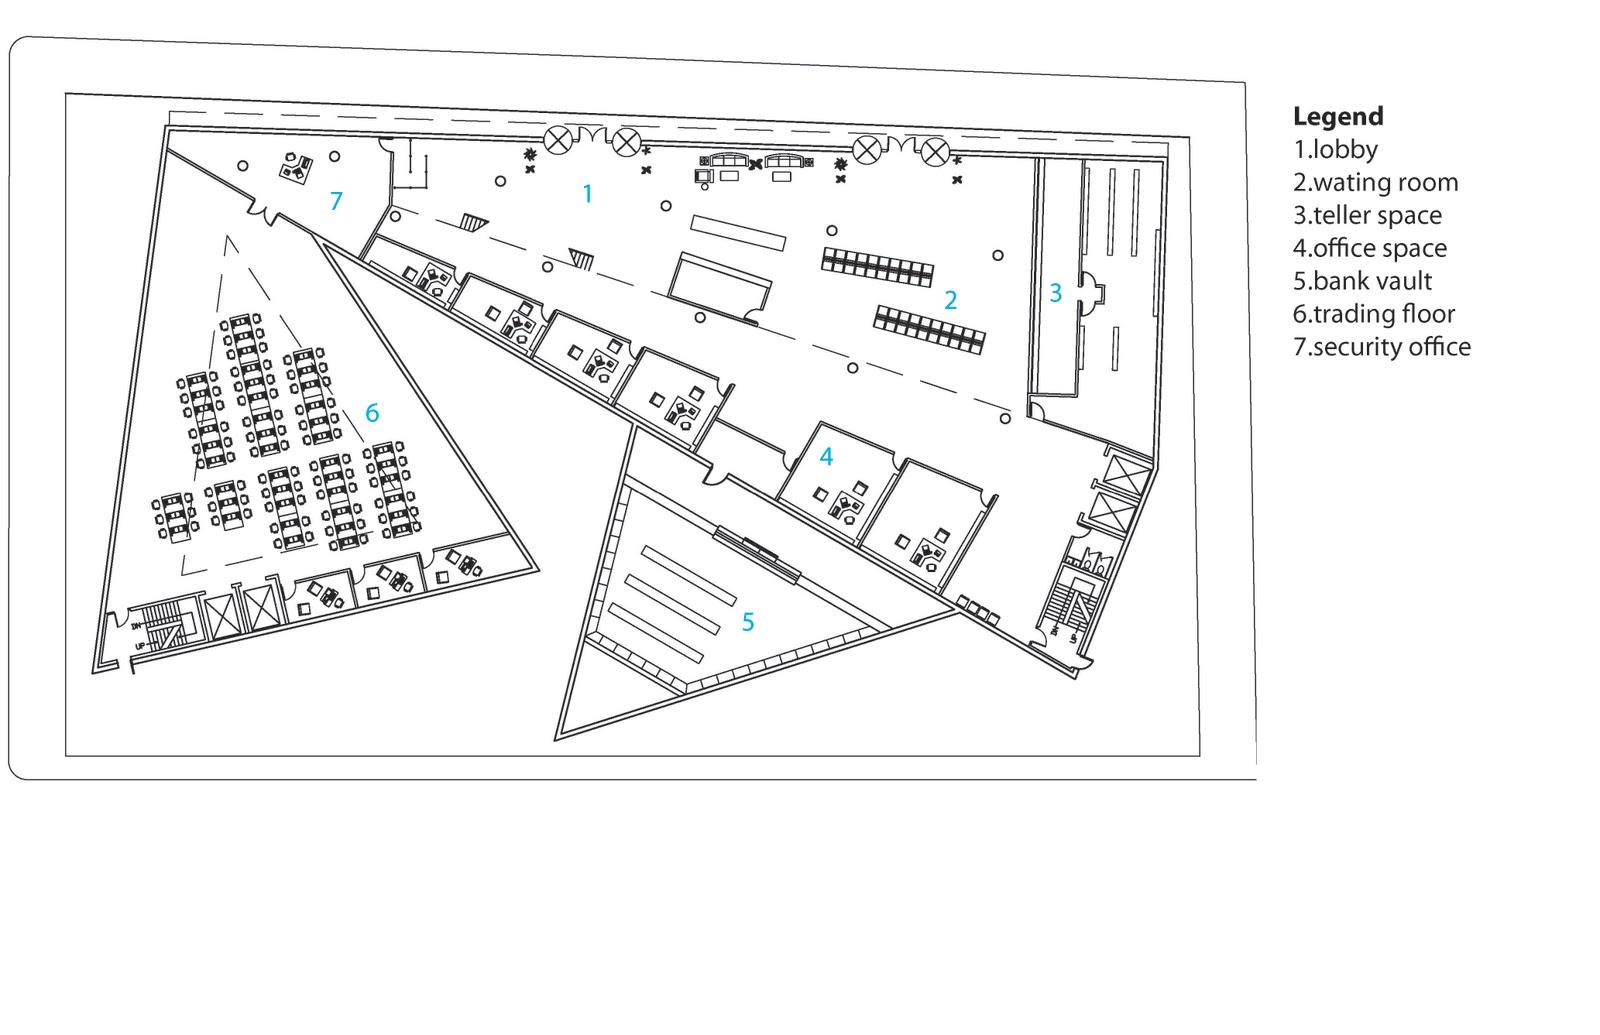 Rreinosogarib Fall 11 Floor Plan Layout